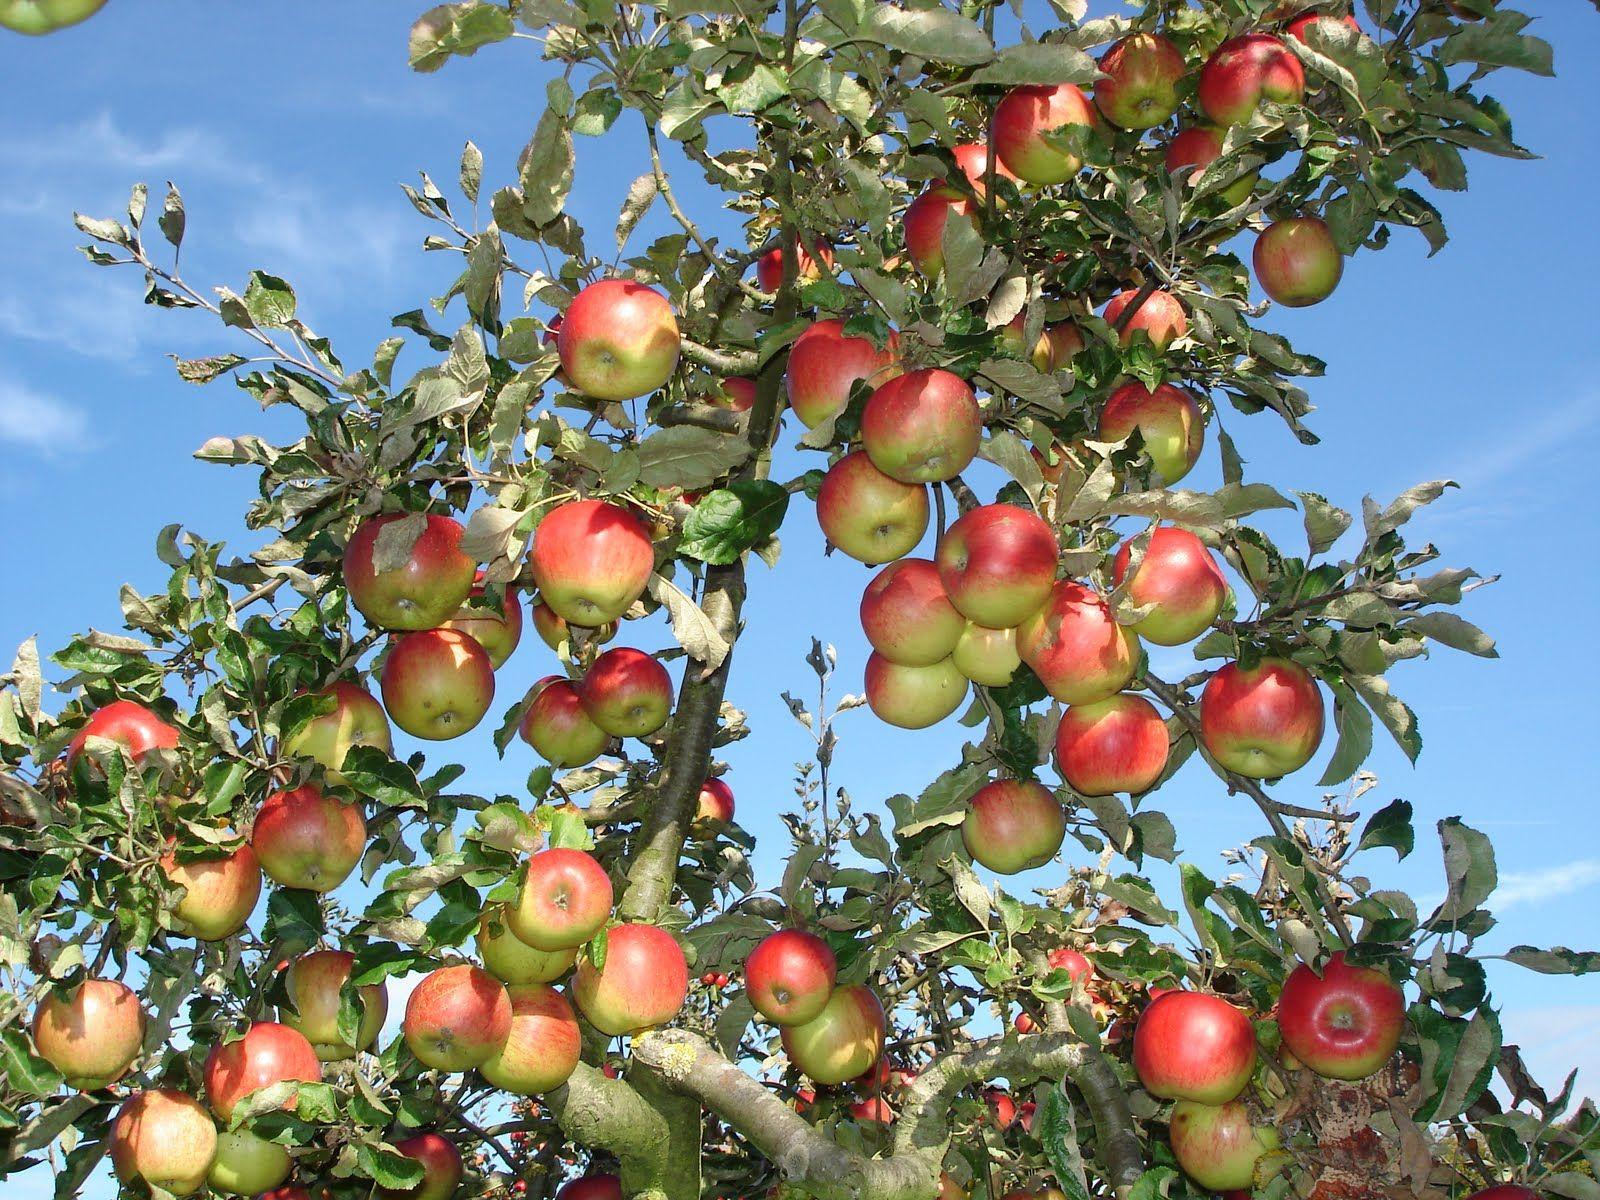 green apple tree wallpaper. apple tree with green apples hd desktop wallpaper high e